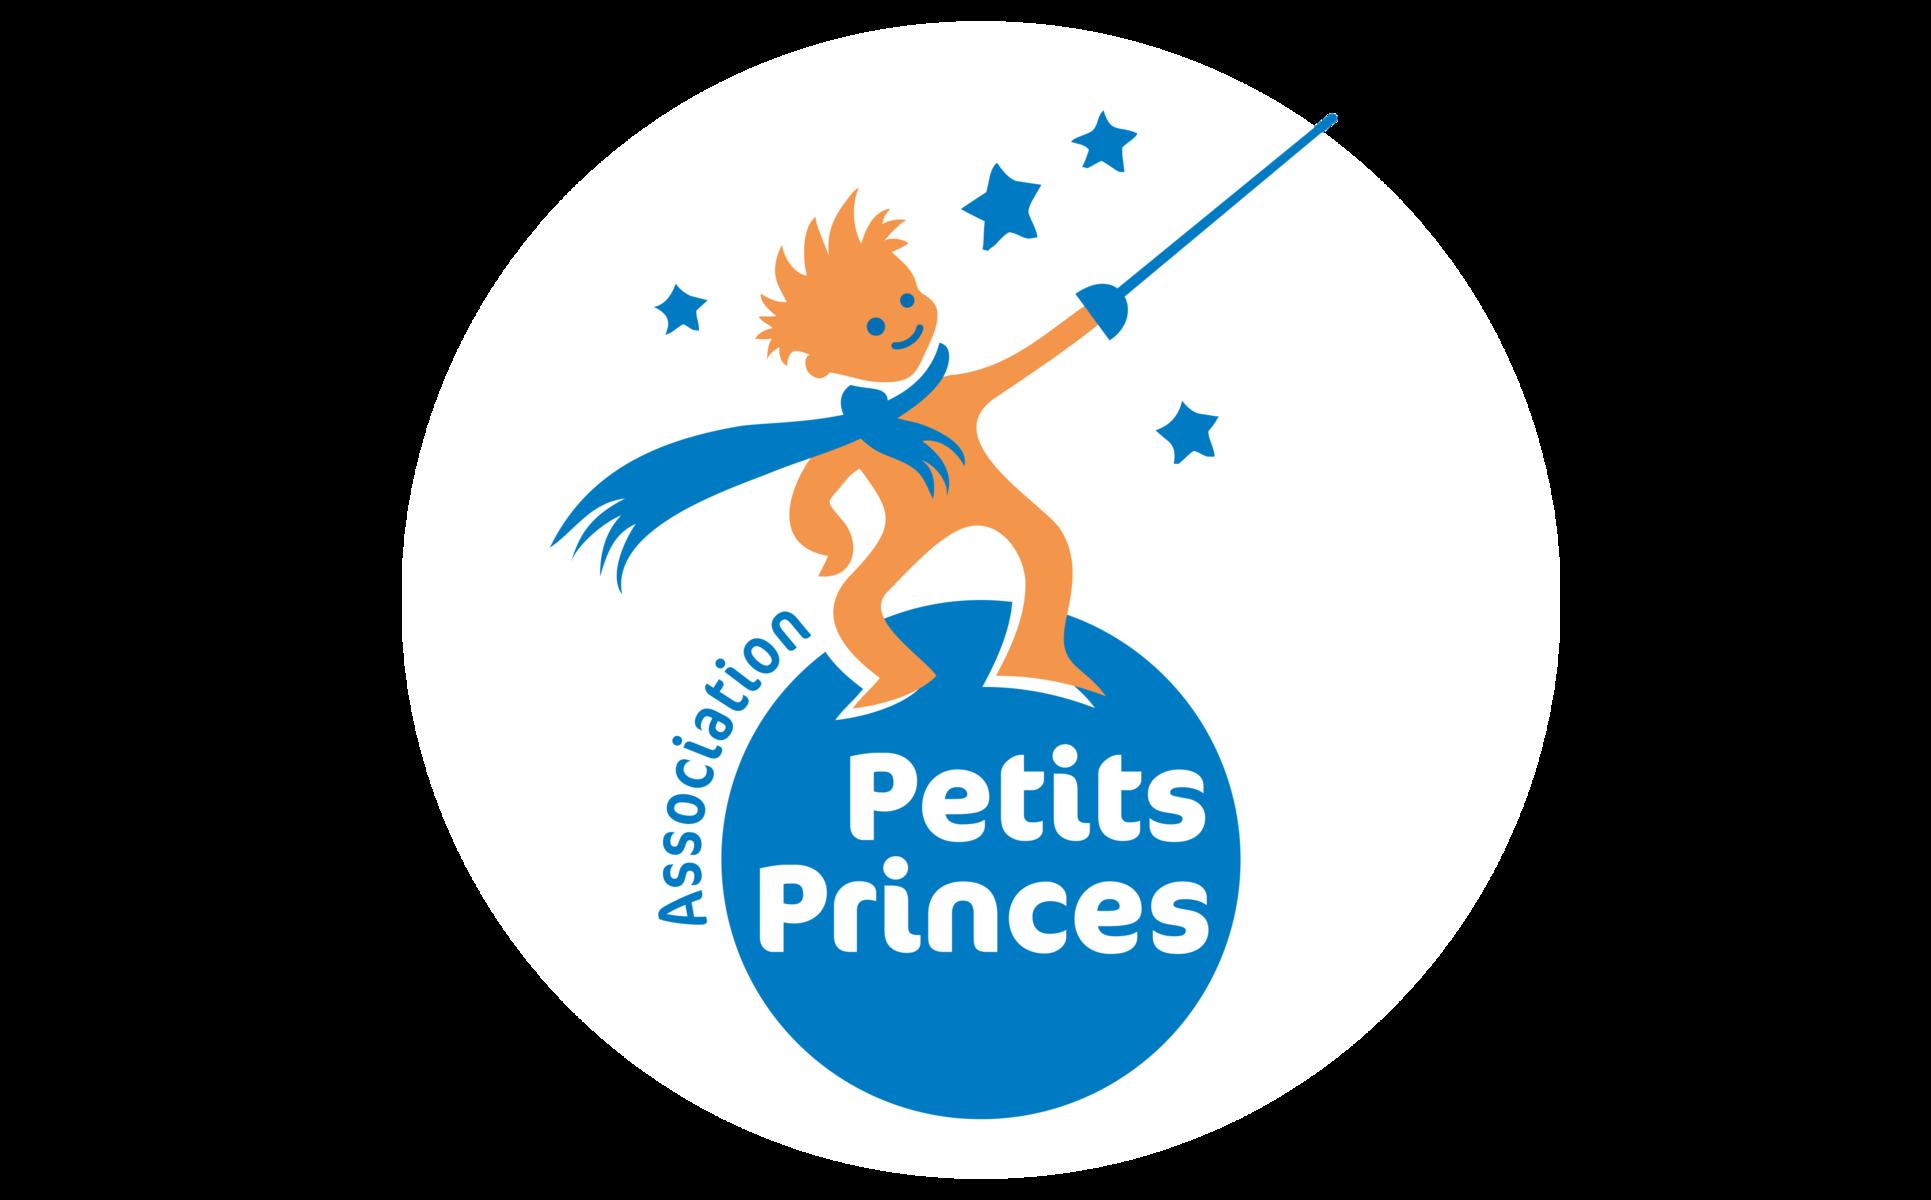 image_thumb_Petits Princes